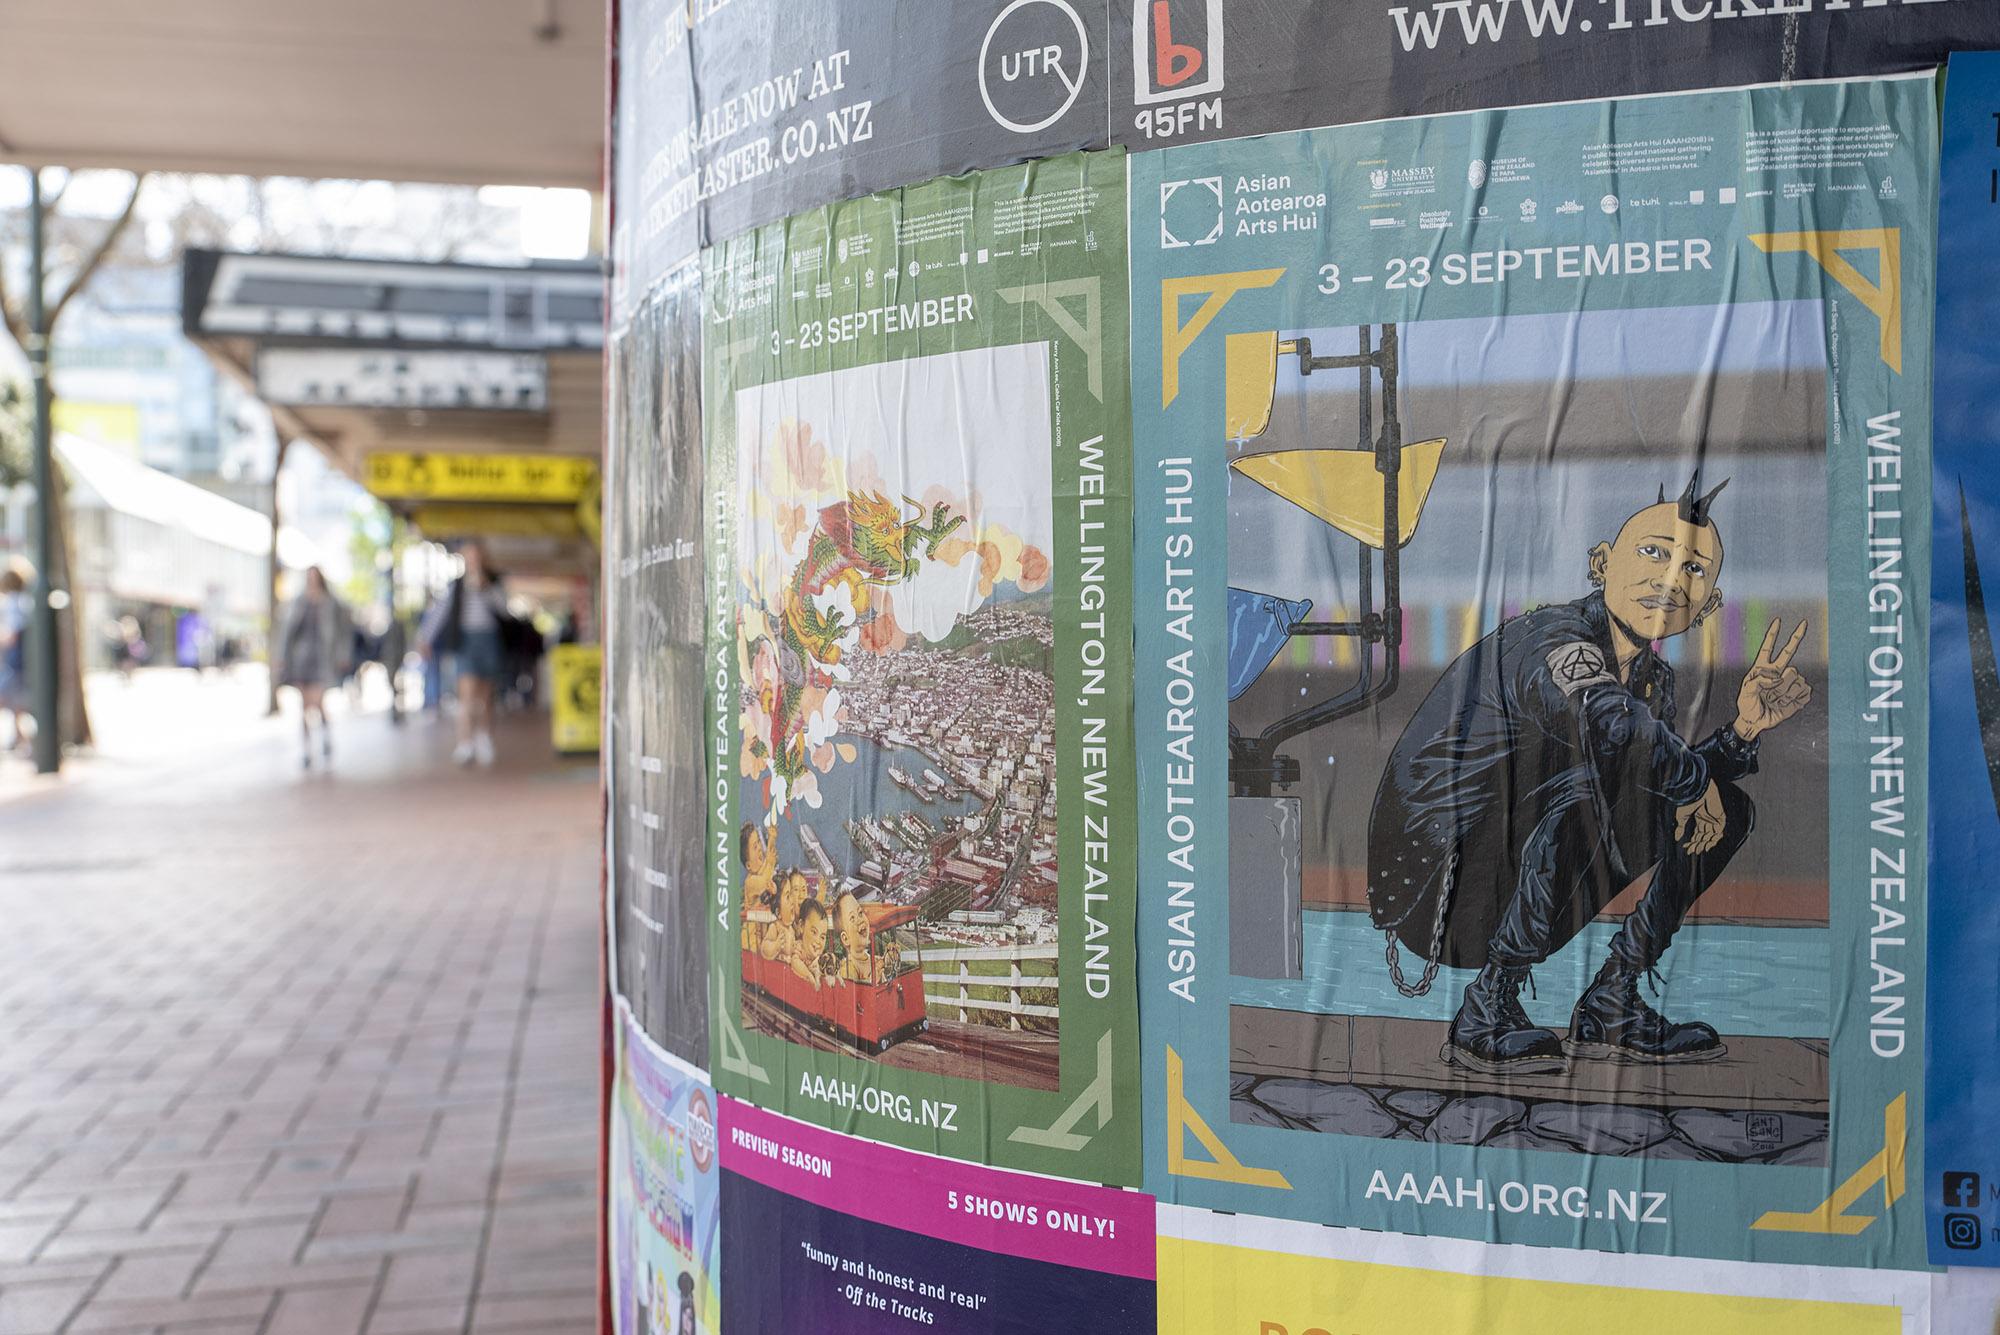 AAAH2018 Artist Billboard Campaign, 1 - 23 September, Wellington CBD. Photo by John Lake